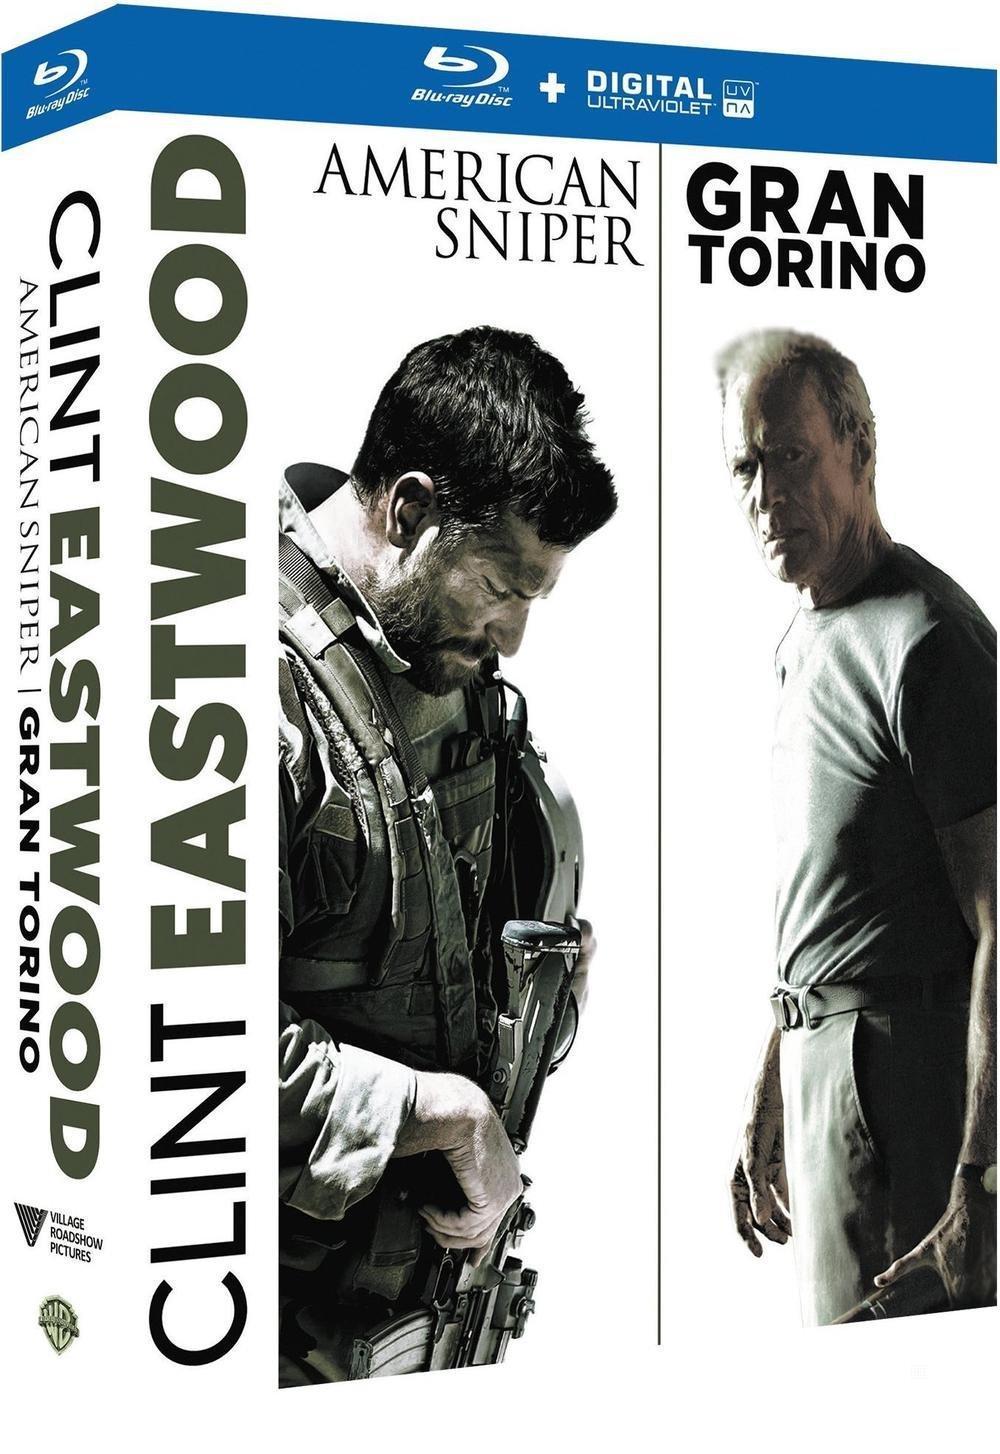 Sélection de coffrets Blu-ray en promotion - Ex : Clint Eastwood - American Sniper + Gran Torino